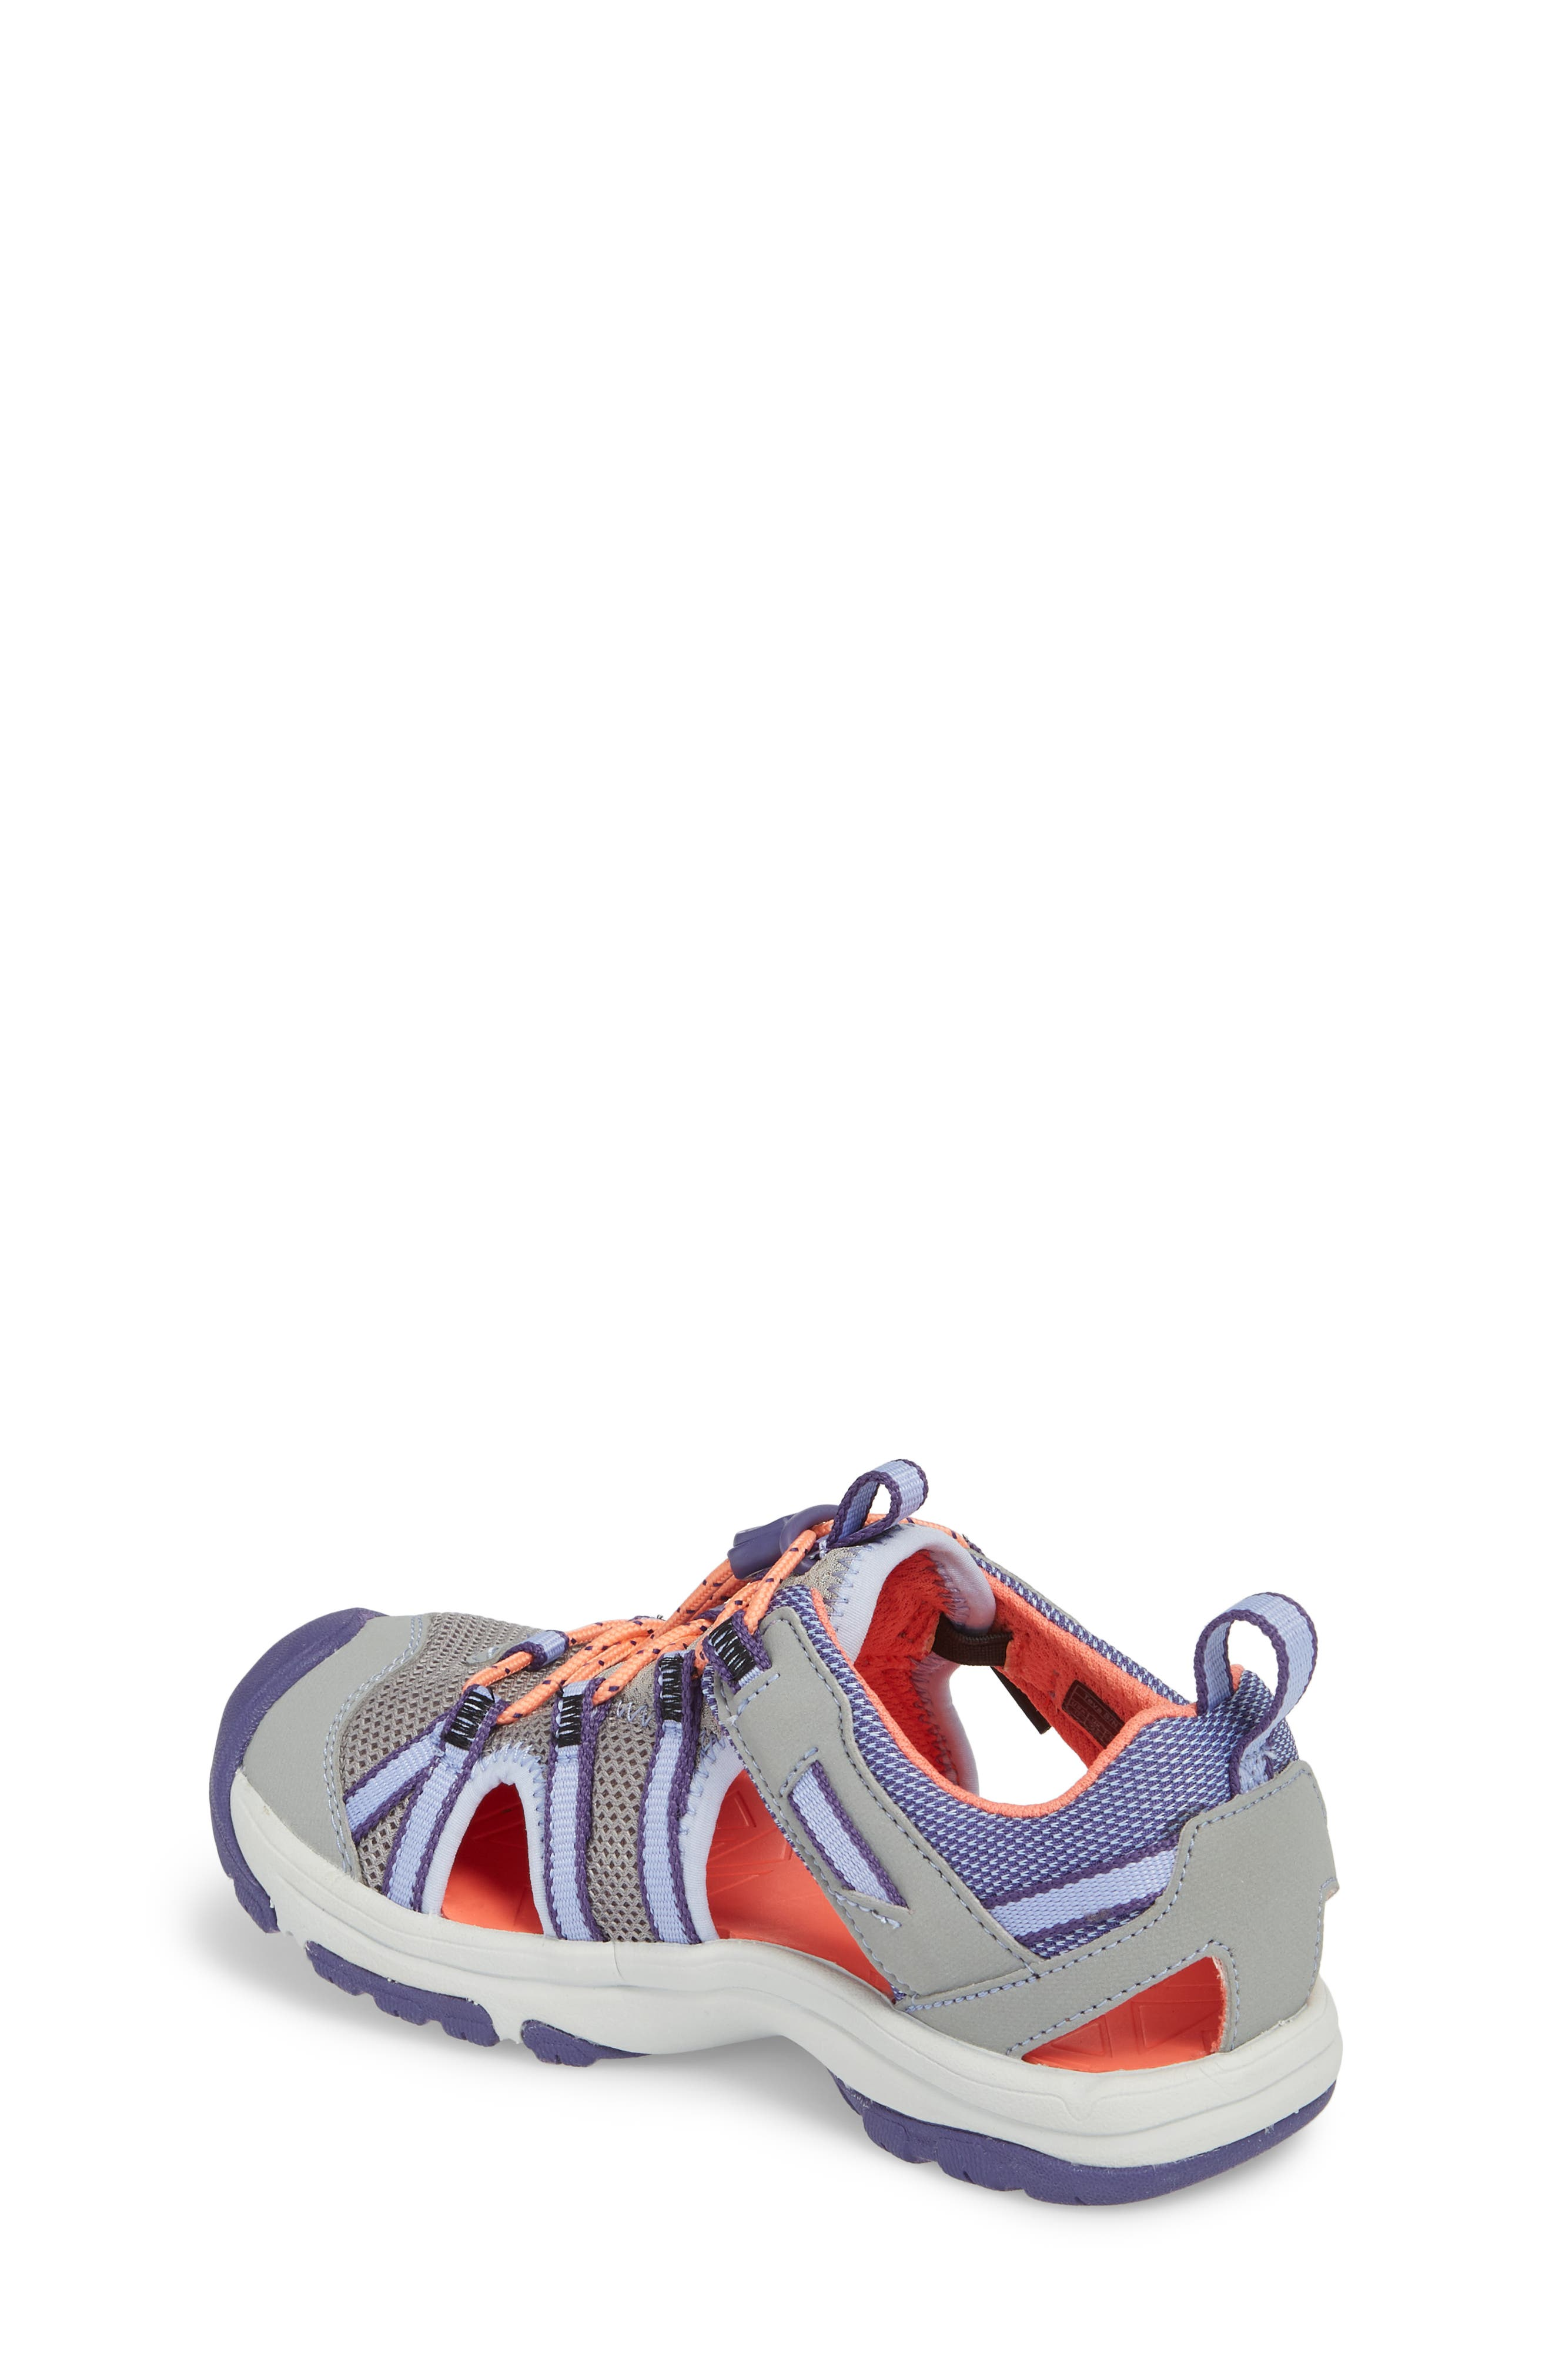 Manatee Sport Sandal,                             Alternate thumbnail 2, color,                             Wild Dove